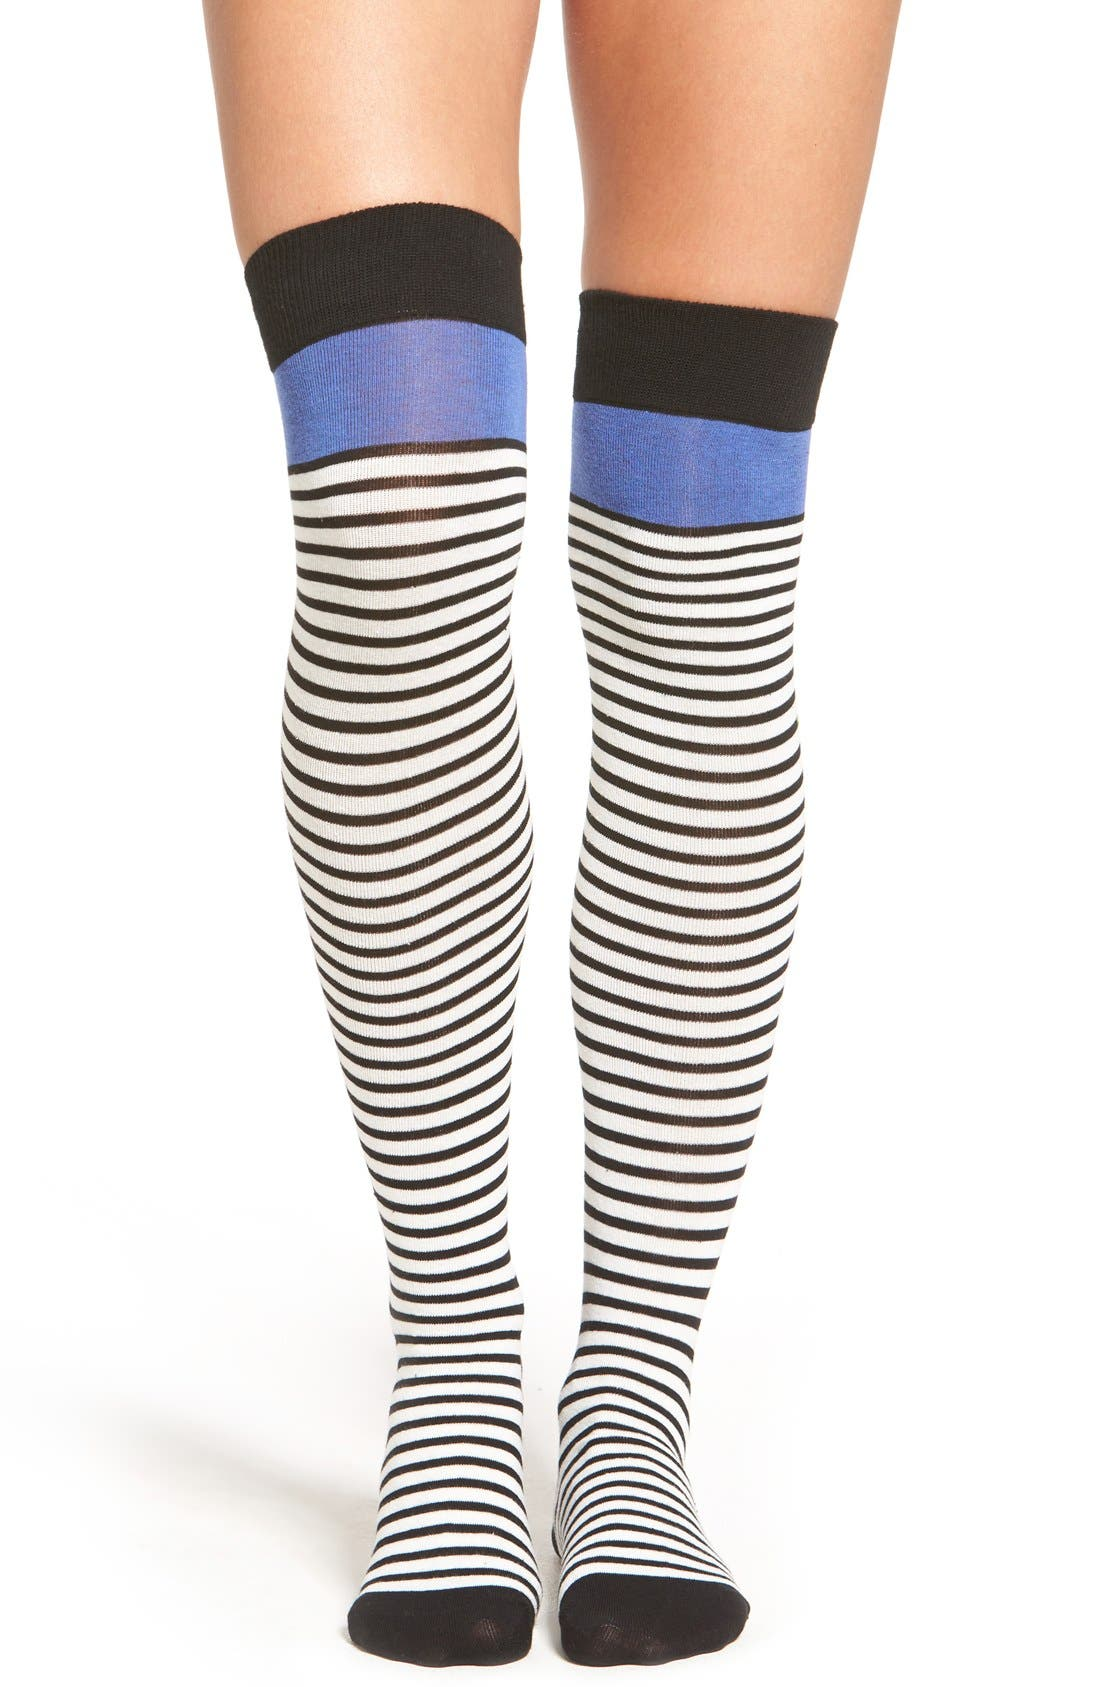 Main Image - kate spade new york 'scuba' stripe over-the-knee socks